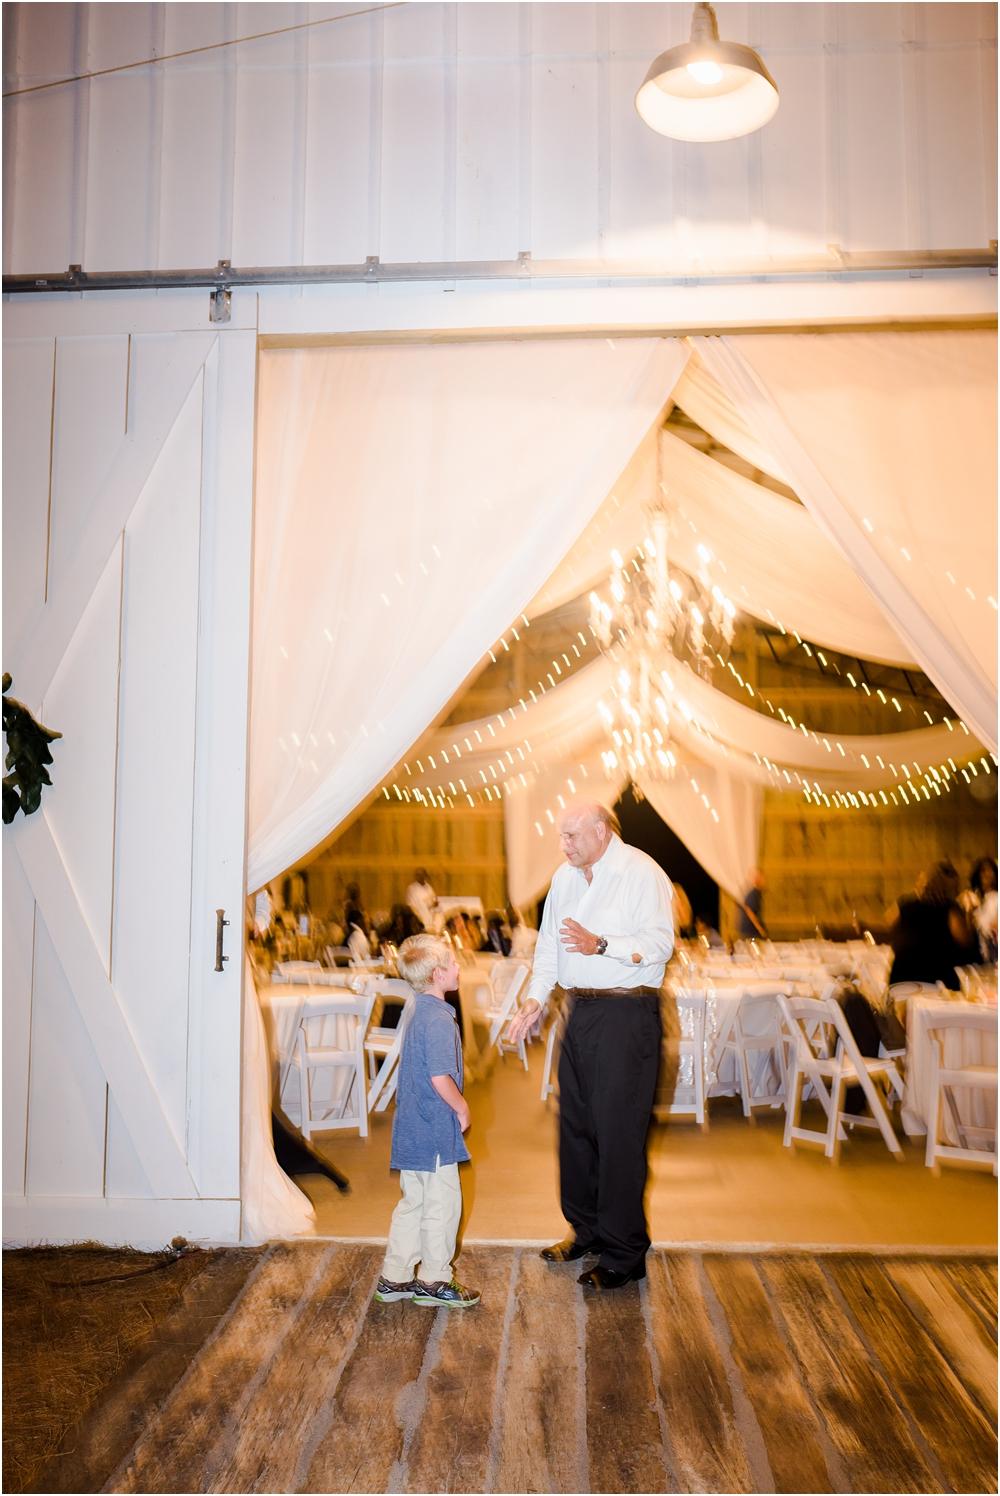 mosley-wedding-kiersten-stevenson-photography-30a-panama-city-beach-dothan-tallahassee-(470-of-472).JPG